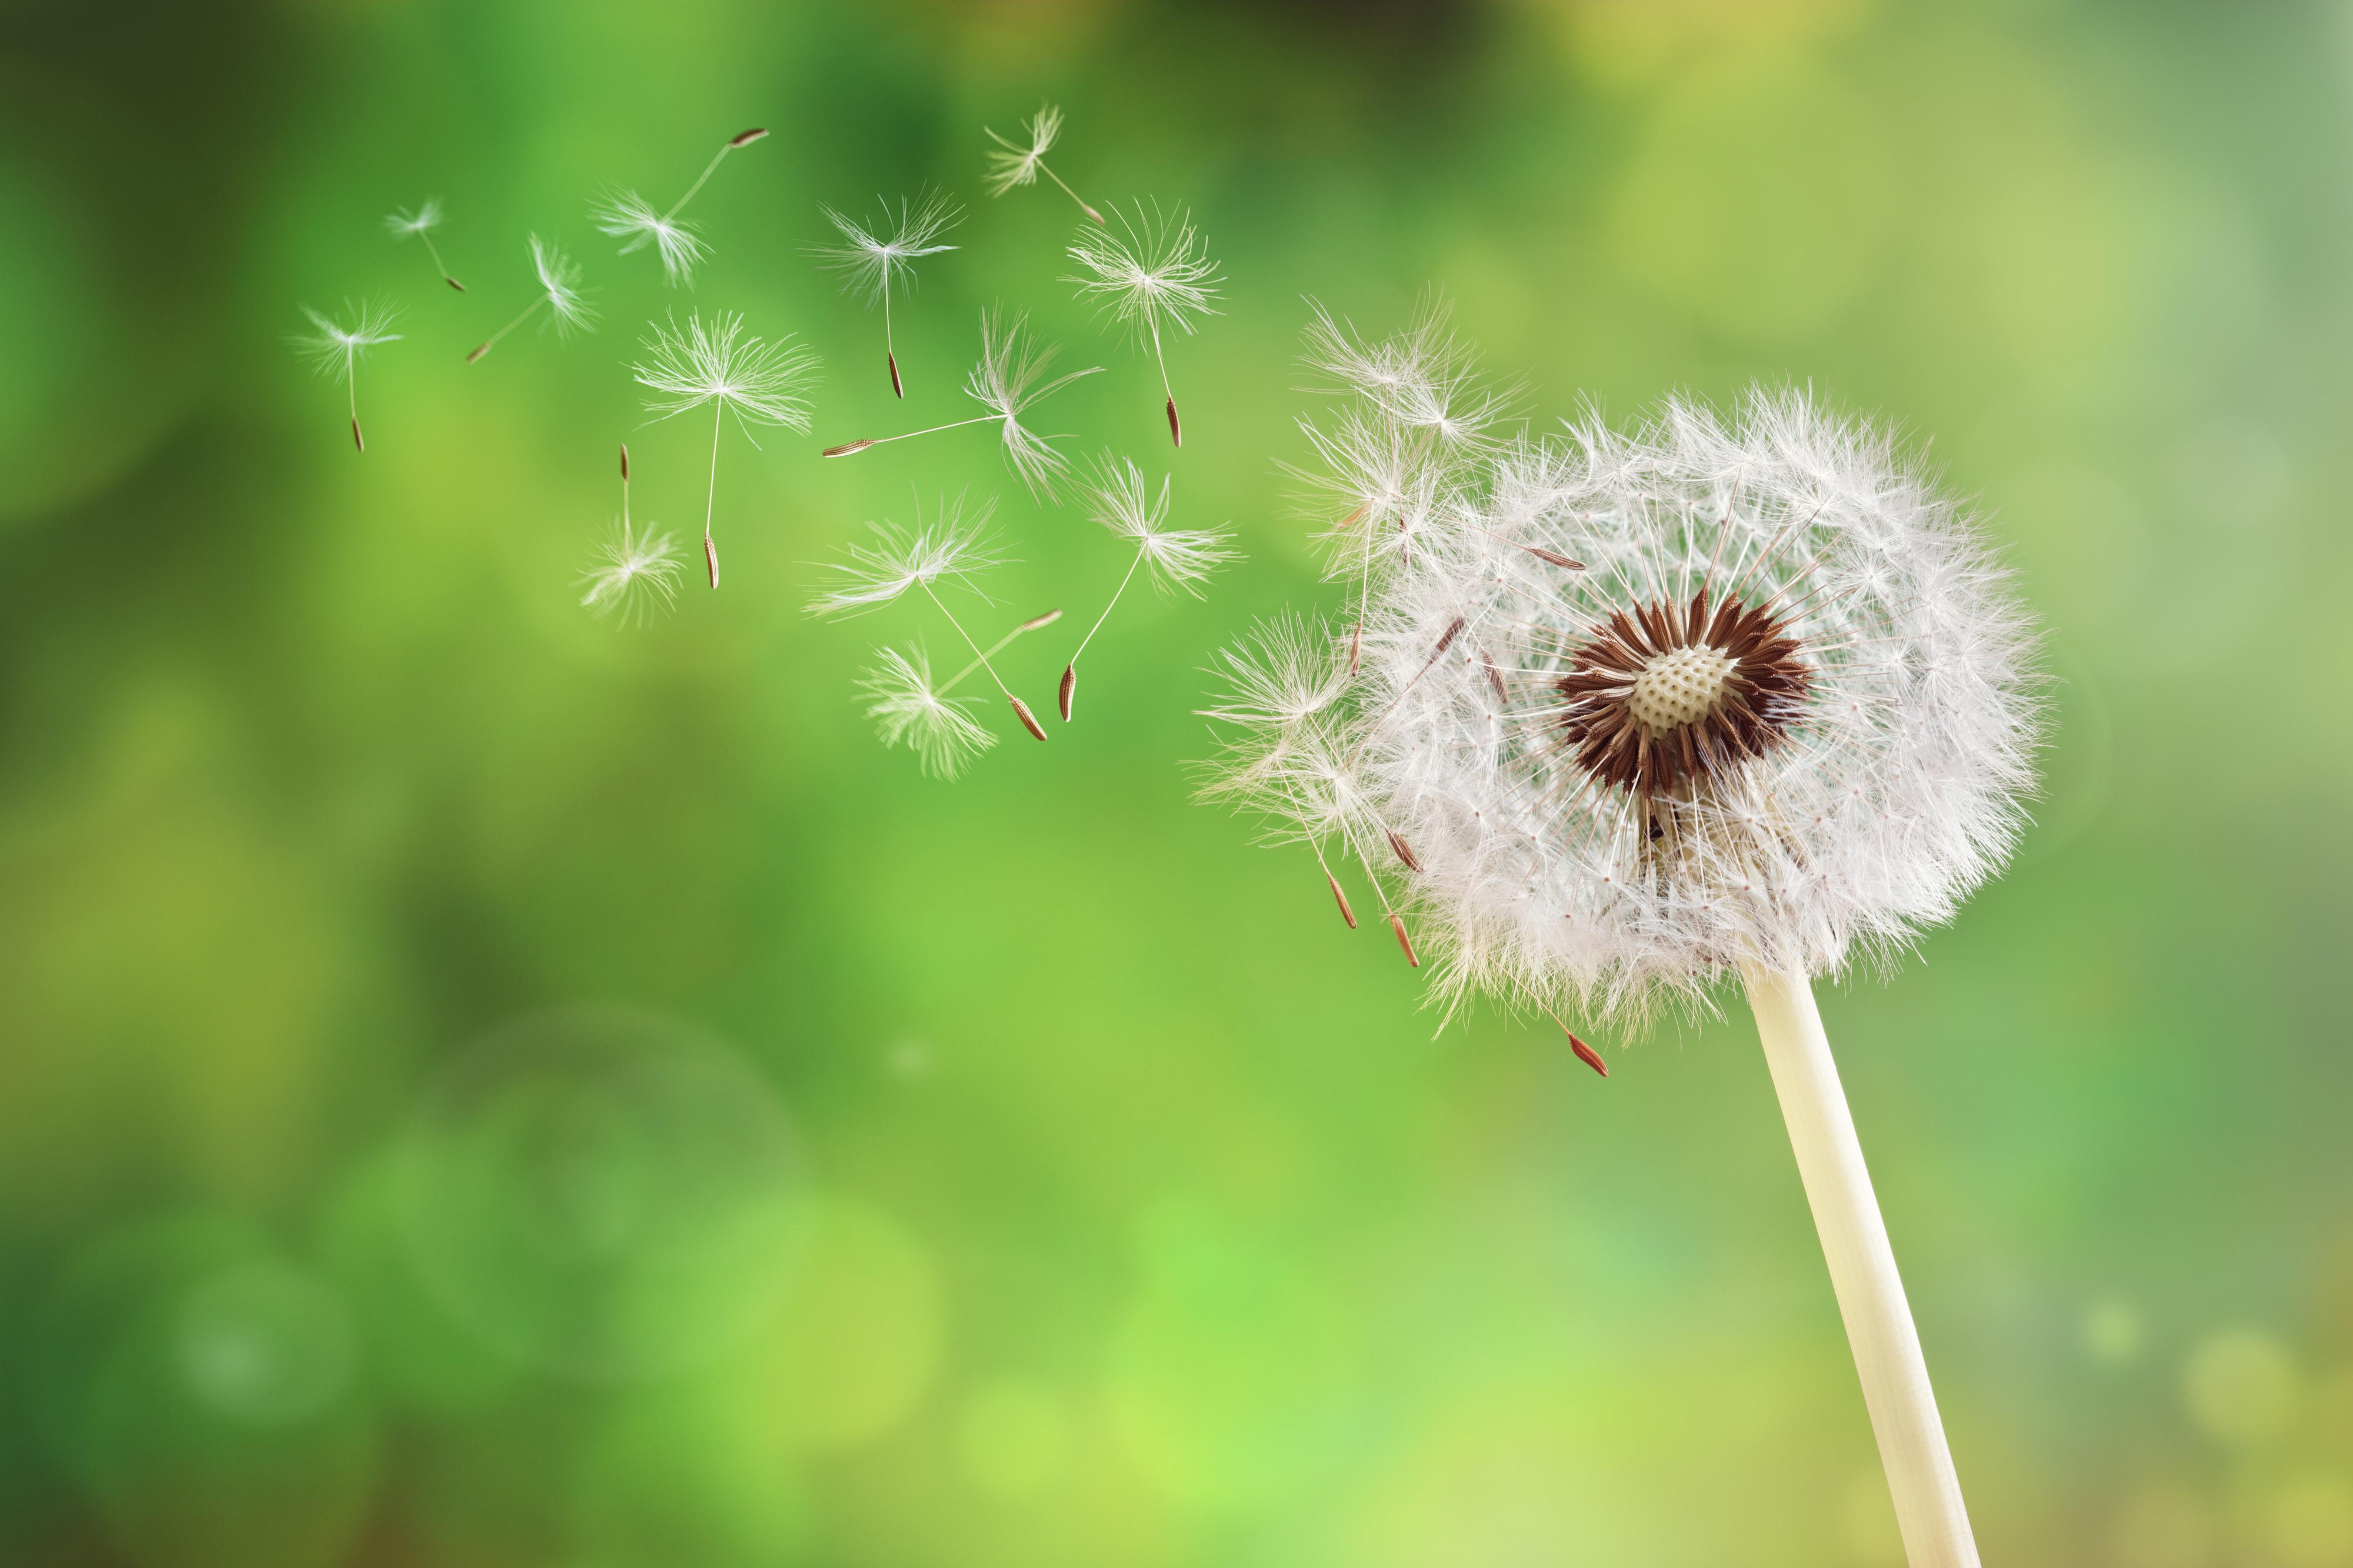 Dandelion seeds - Parachute seeds 2 - 72 ppi